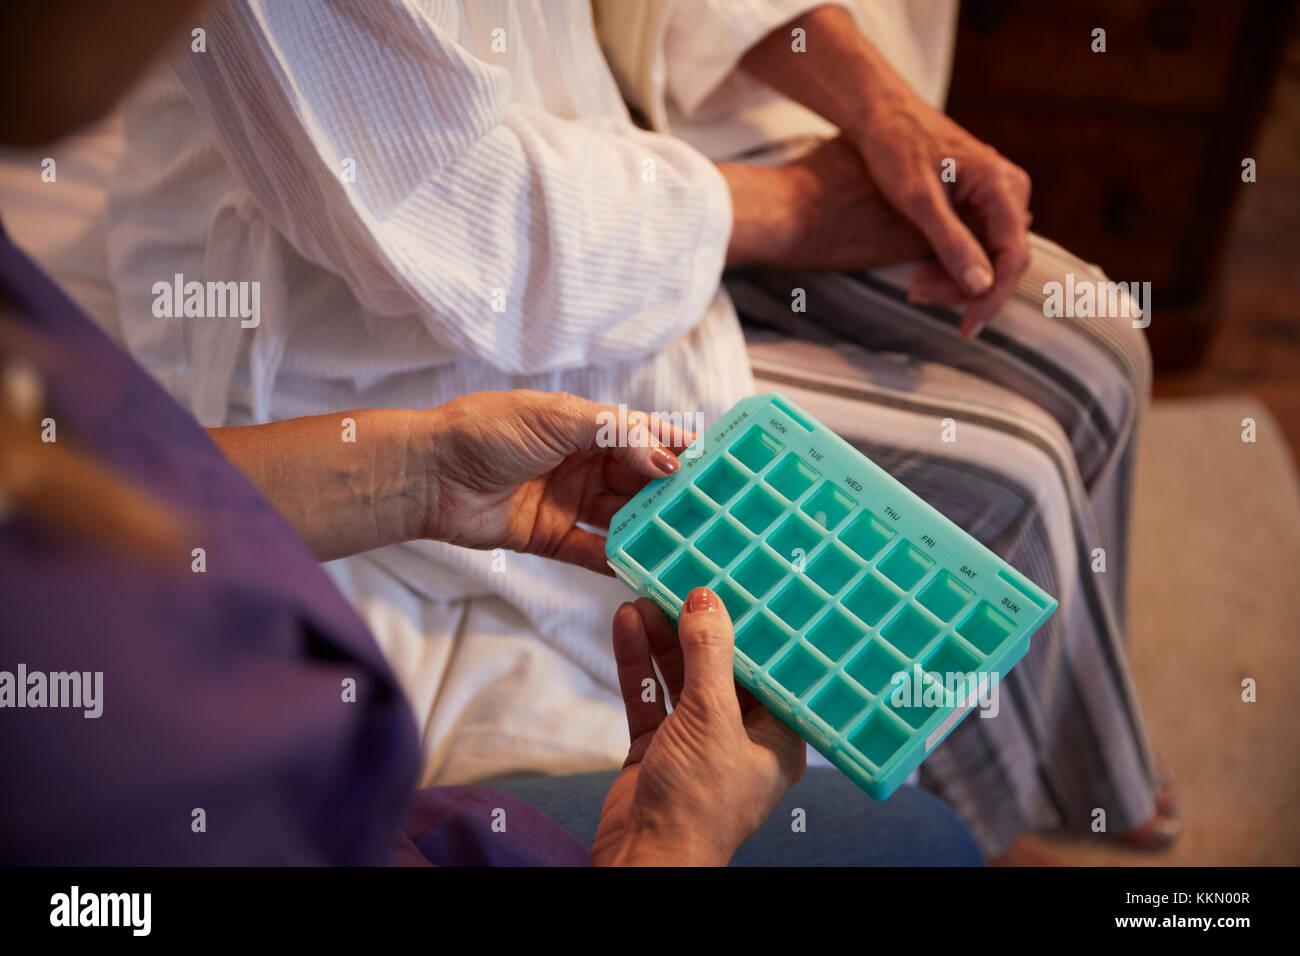 Nurse Helping Senior Woman To Organize Medication On Home Visit - Stock Image